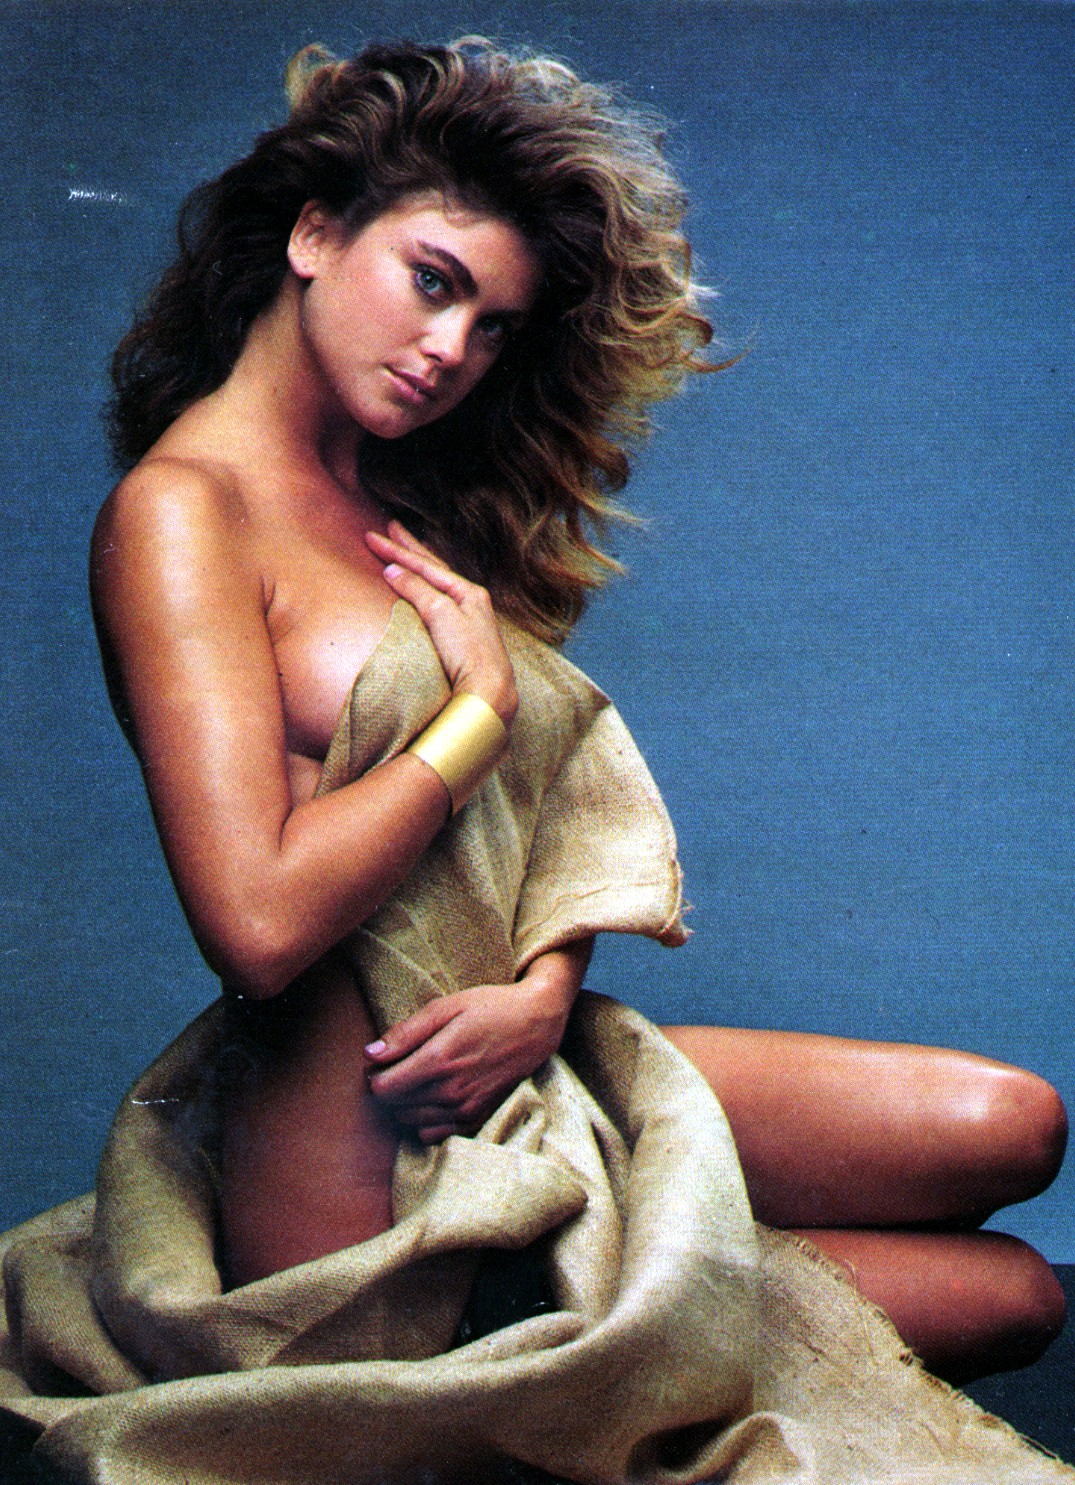 Kathy ireland nude photos — photo 4